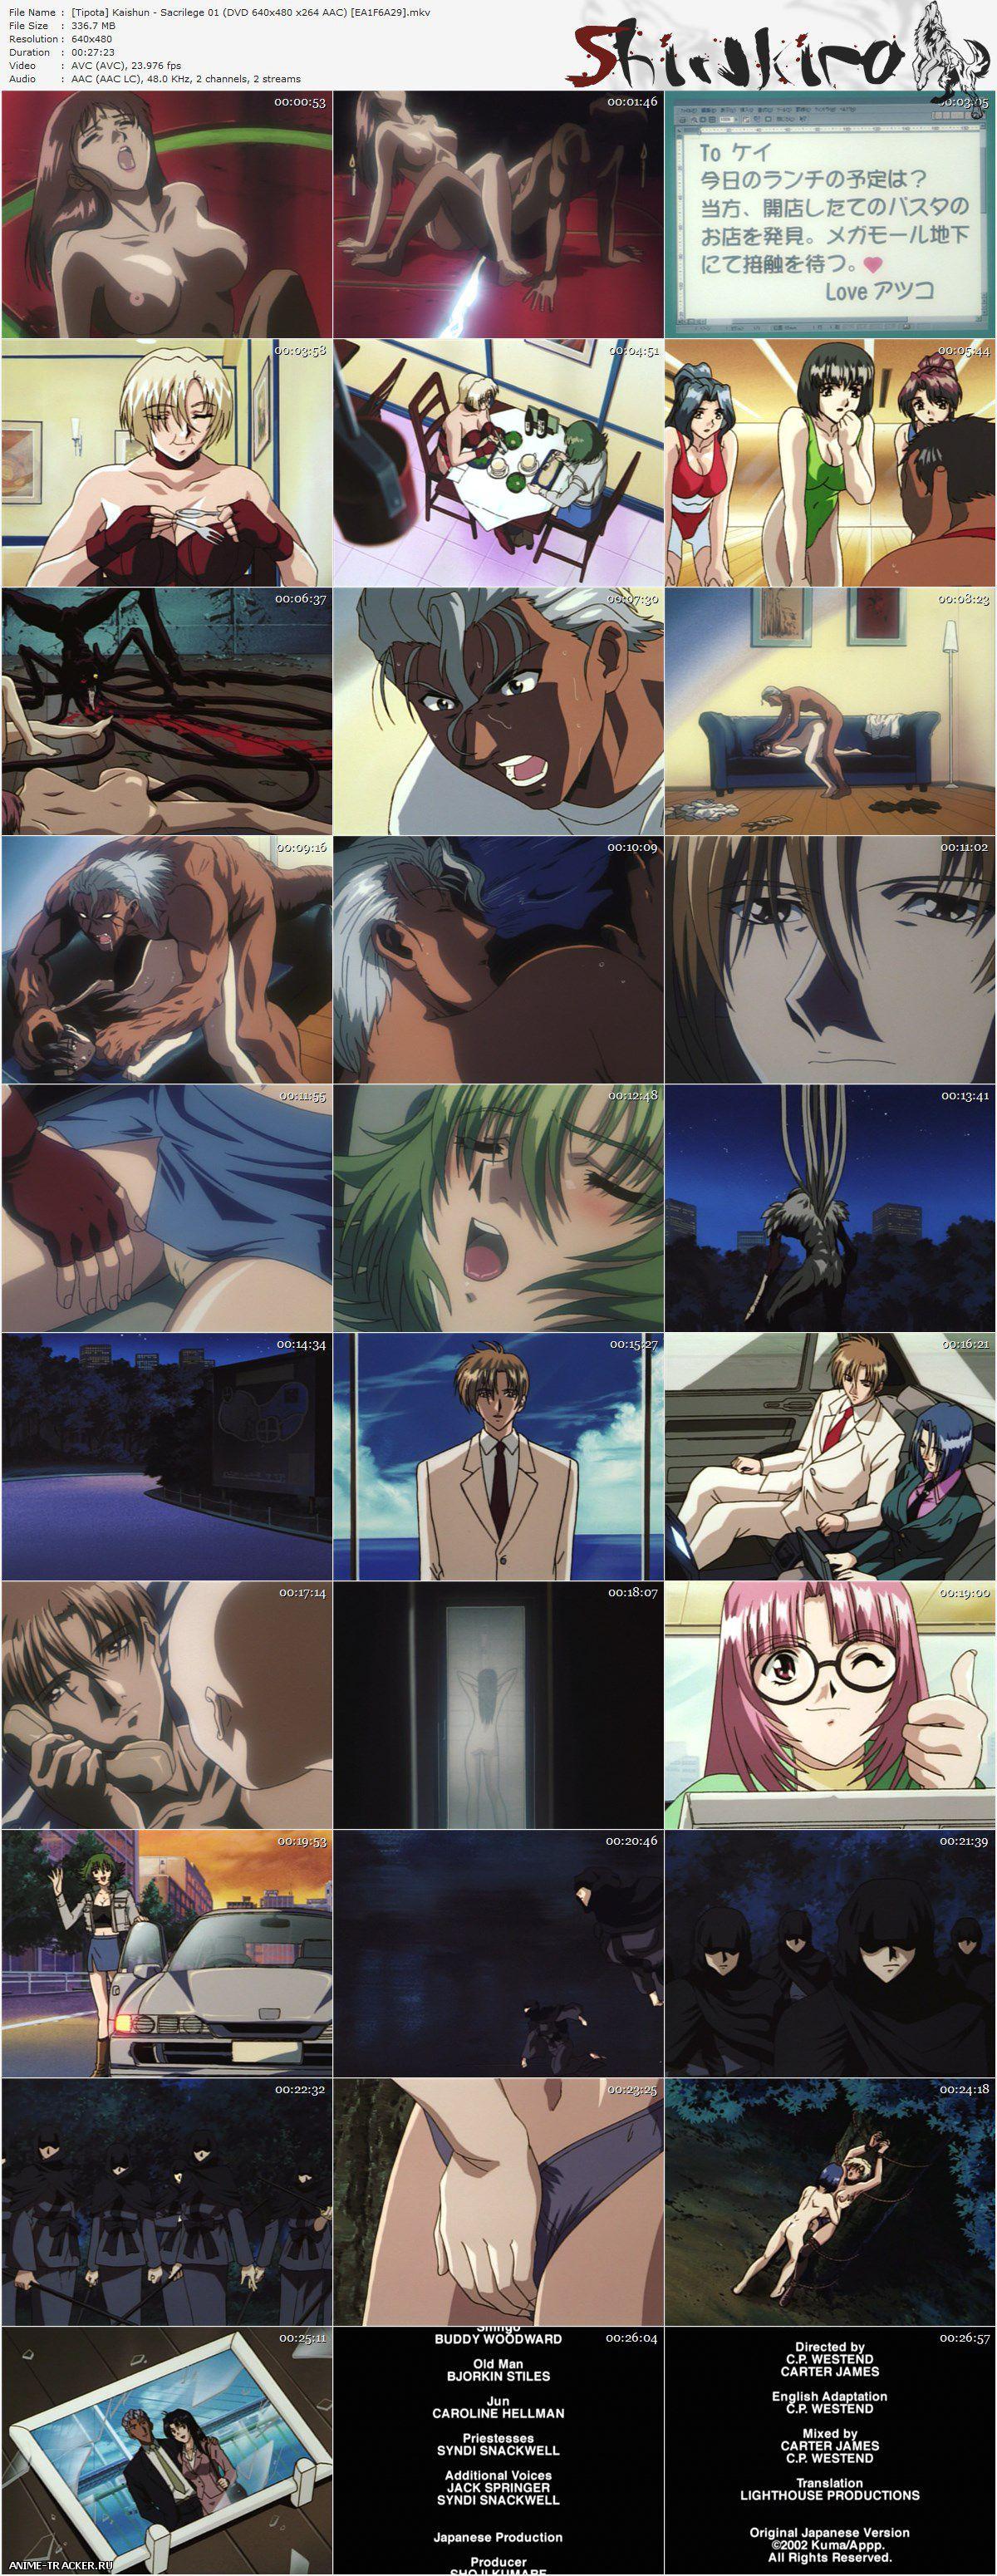 Sacrilege / Rejuvenation / Kaishun / Святотатство [2 из 2] [RUS,ENG,JAP] Anime Hentai